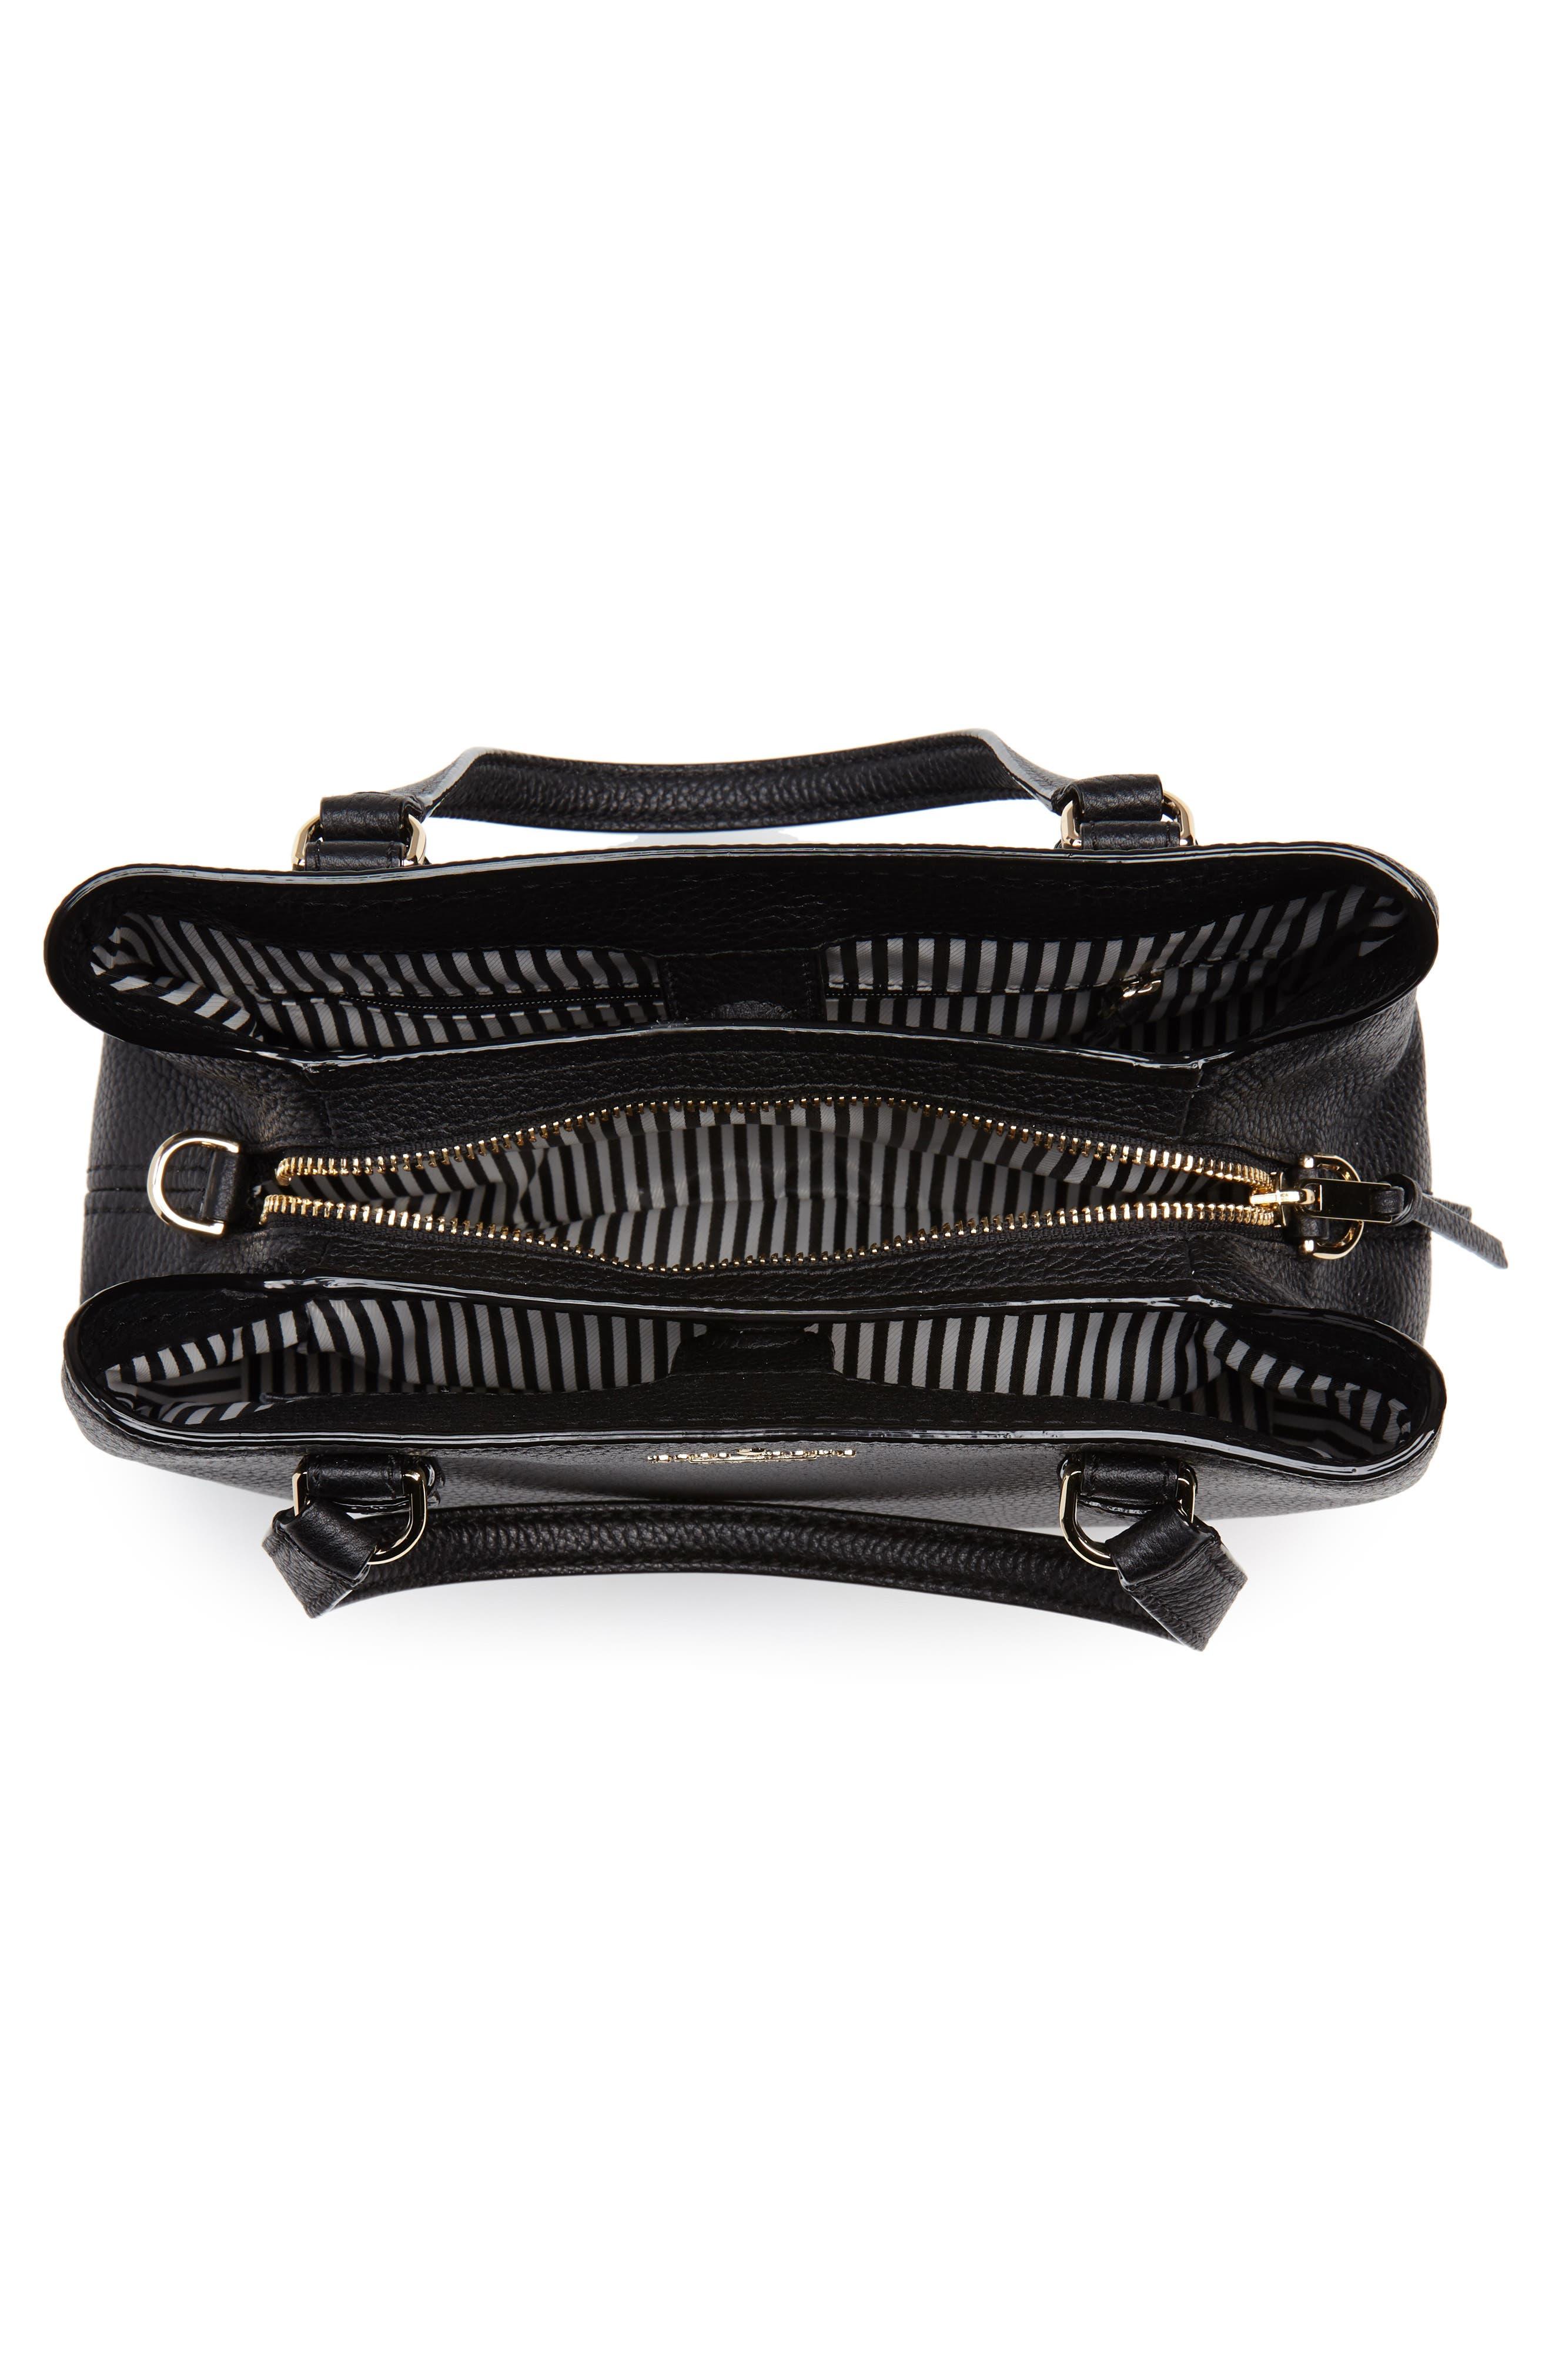 jackson street – small octavia leather satchel,                             Alternate thumbnail 4, color,                             001